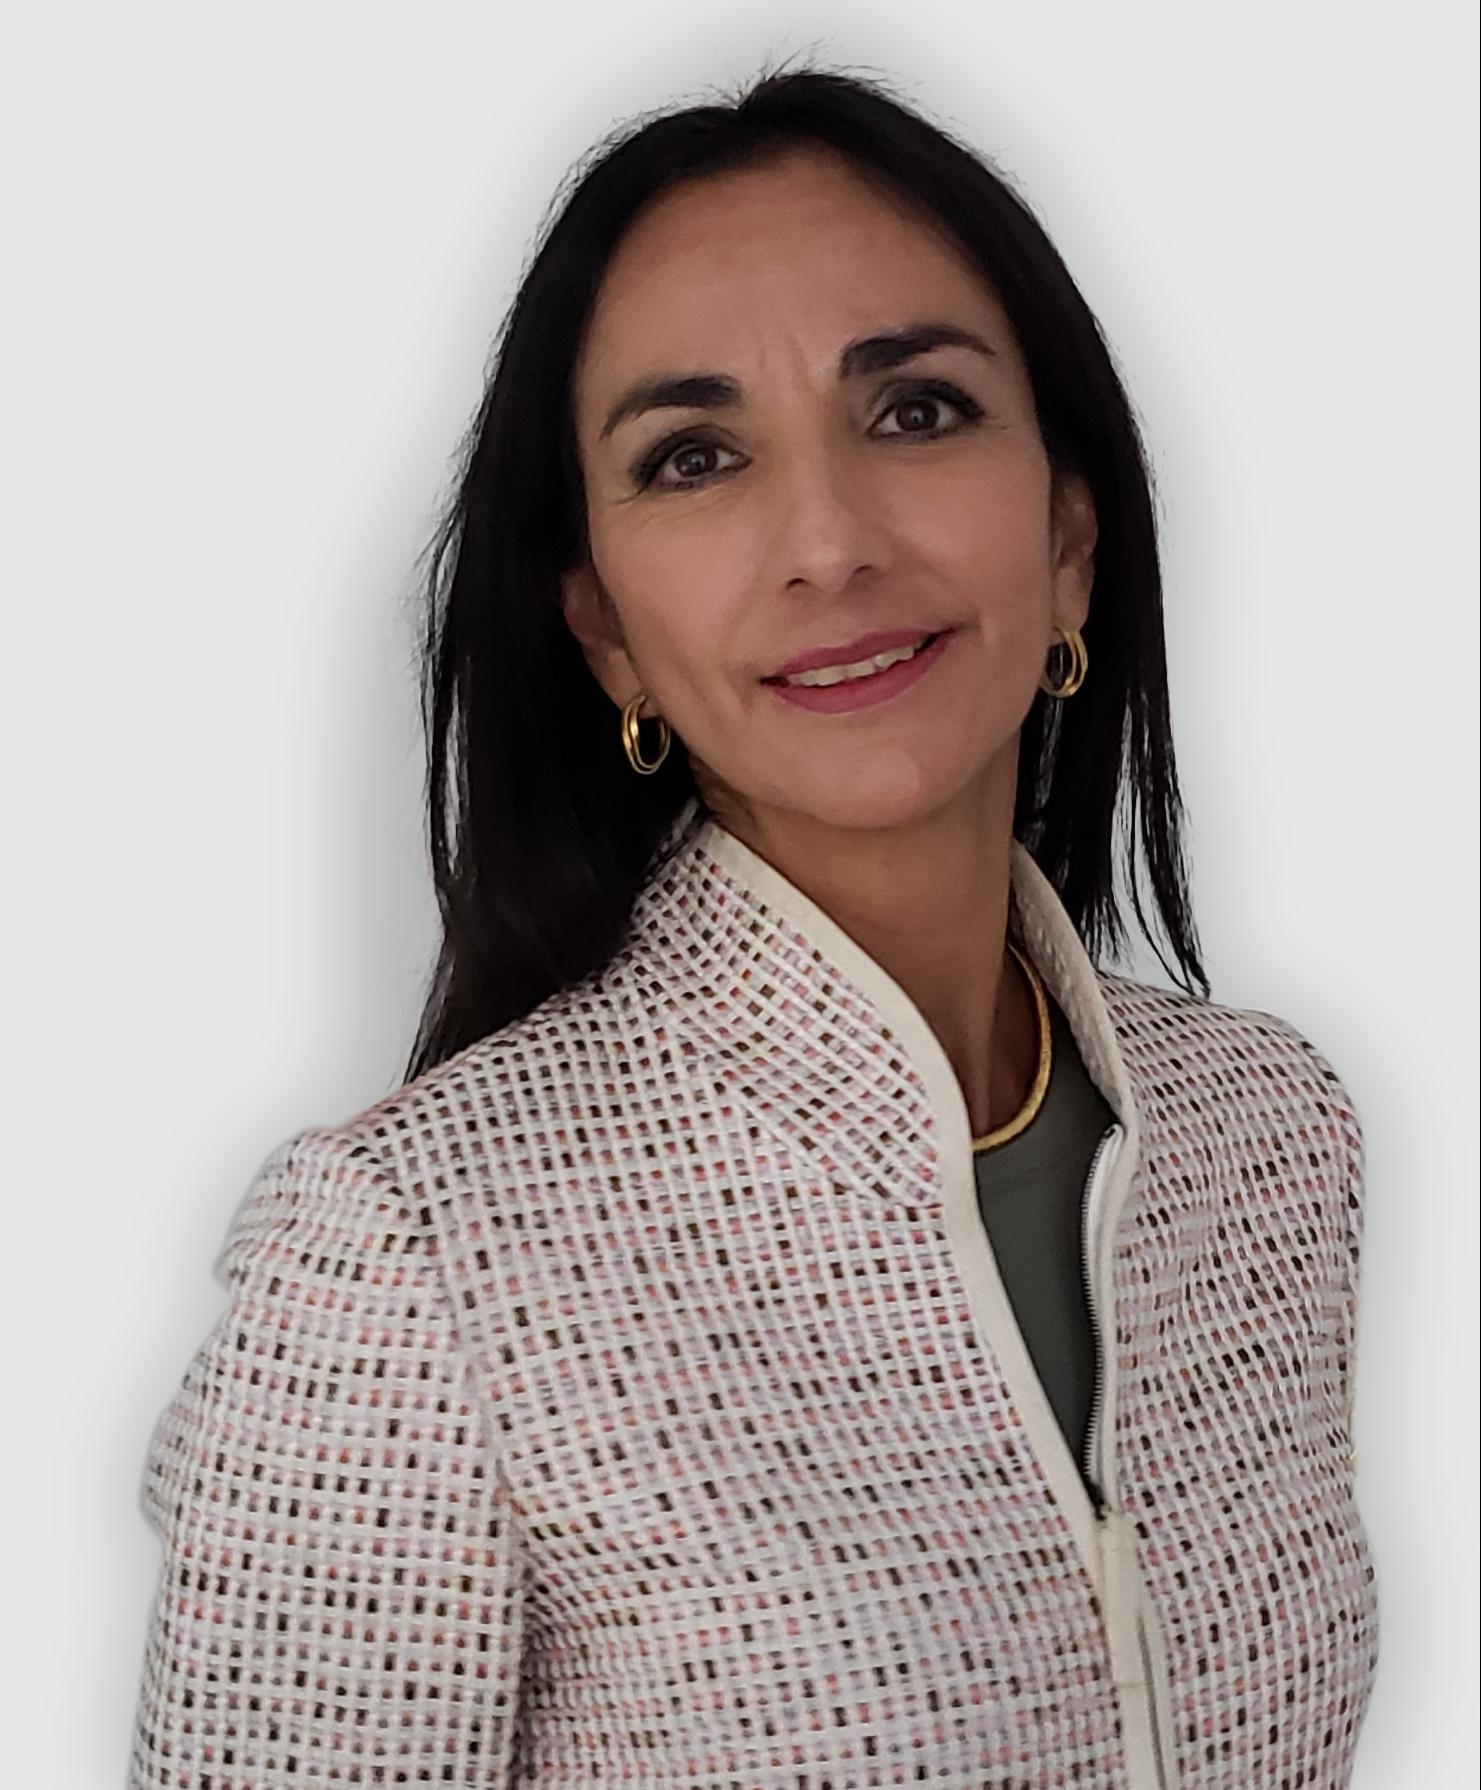 Mariela Castano